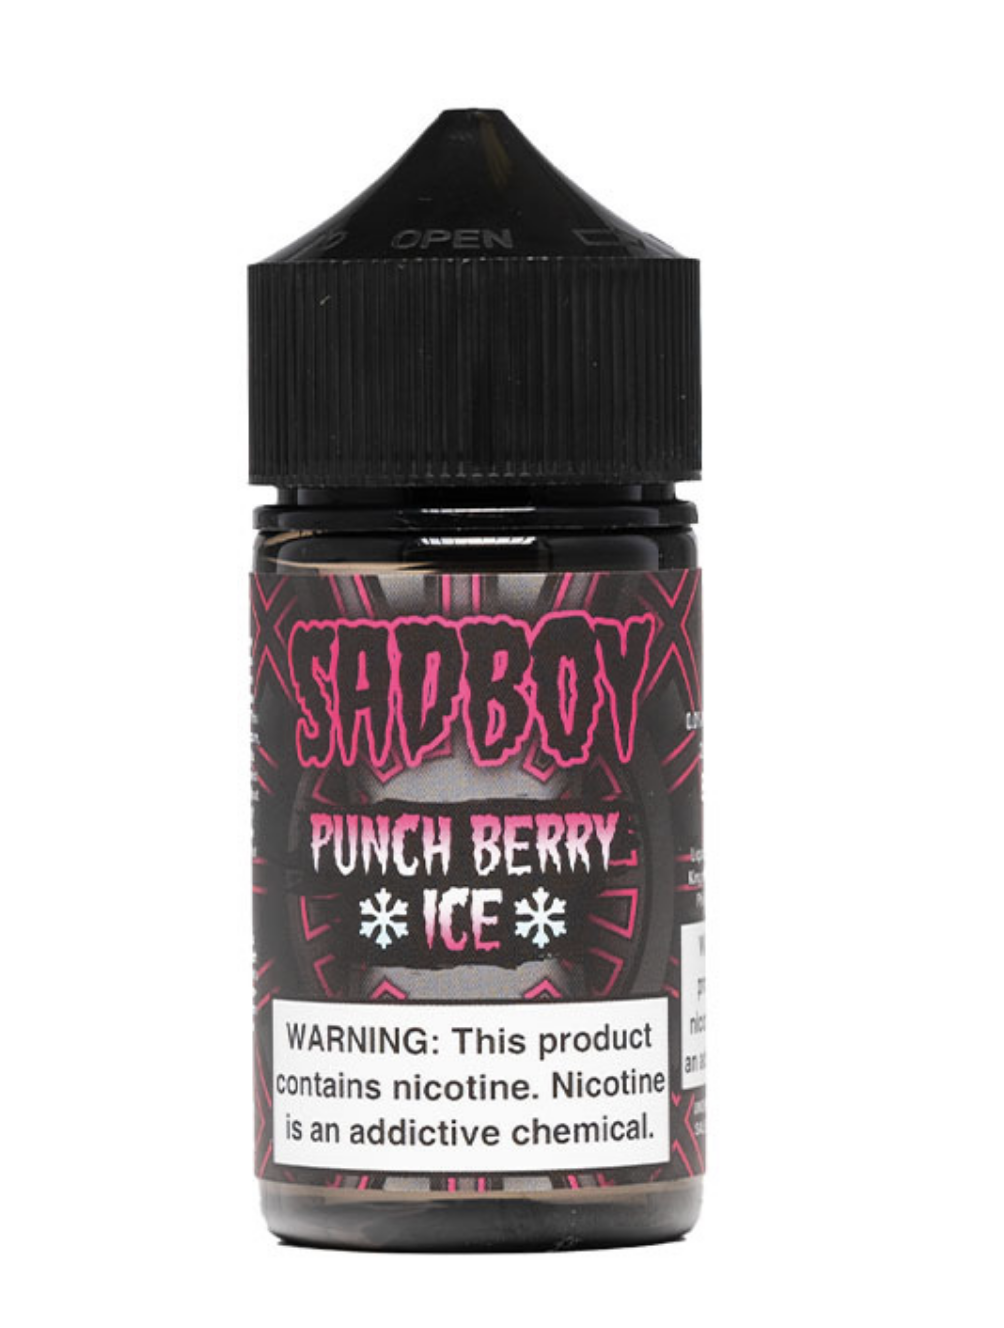 Sadboy Punch Berry Ice 60ml